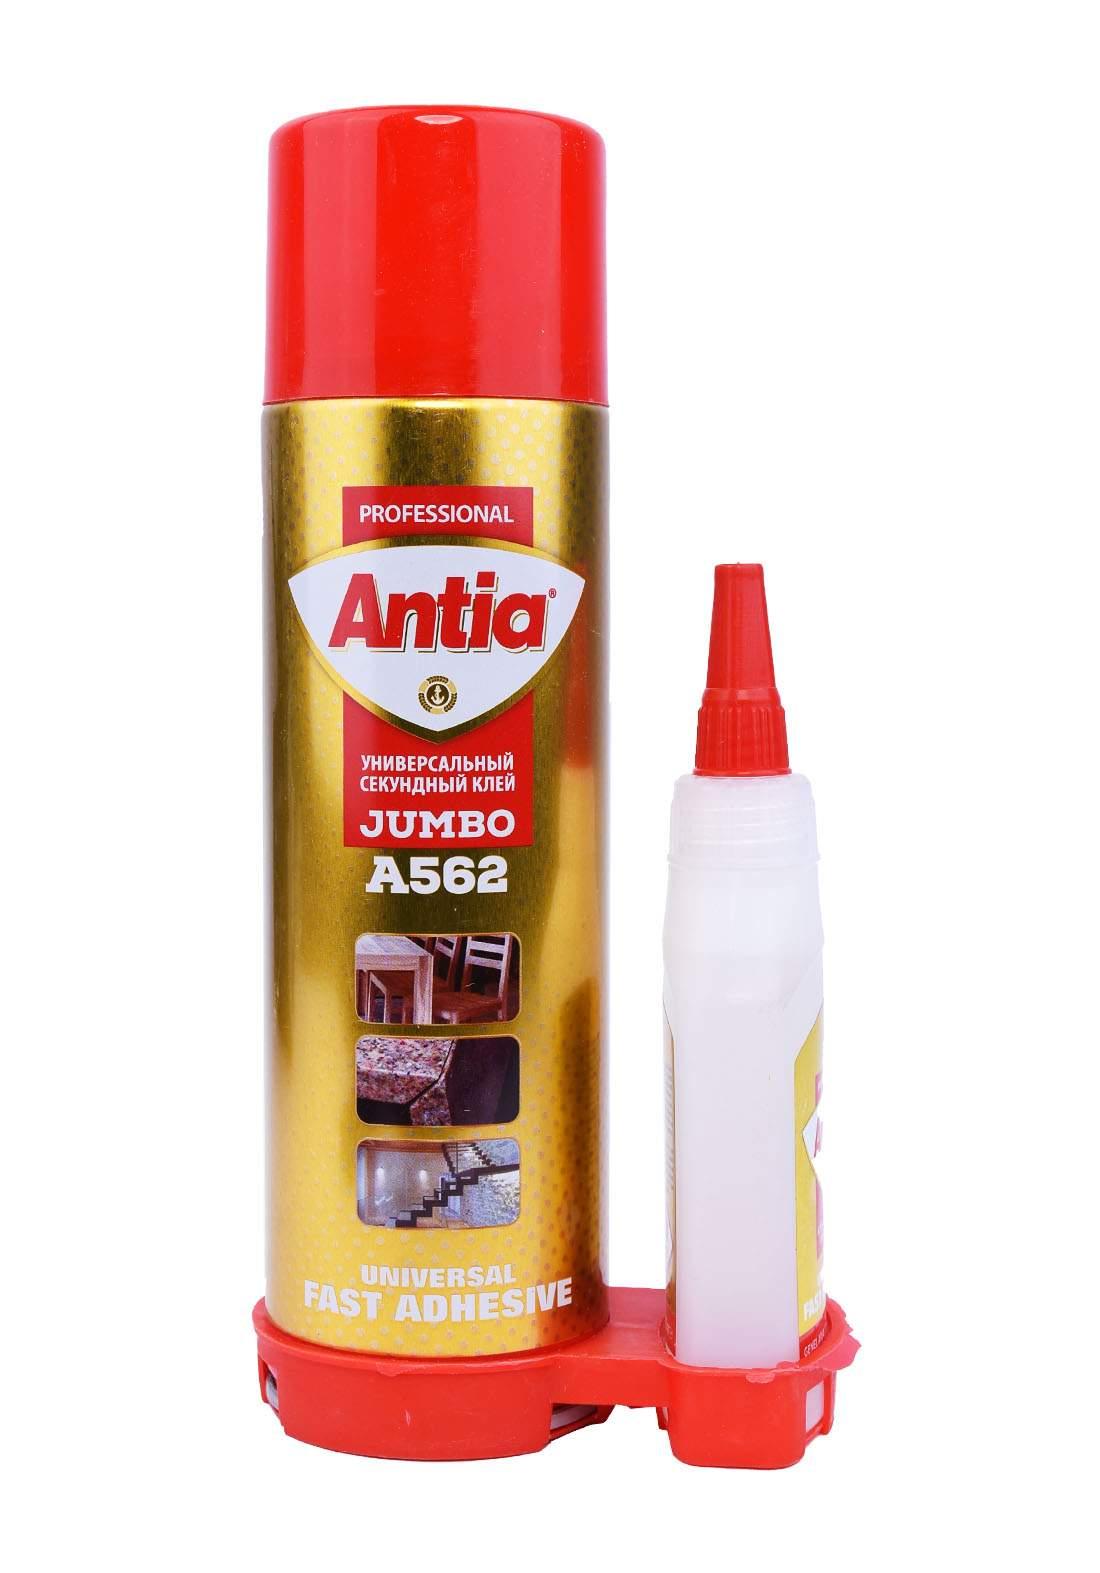 Antia Universal Fast Adhesive Mdf A562 500ml لاصق سريع